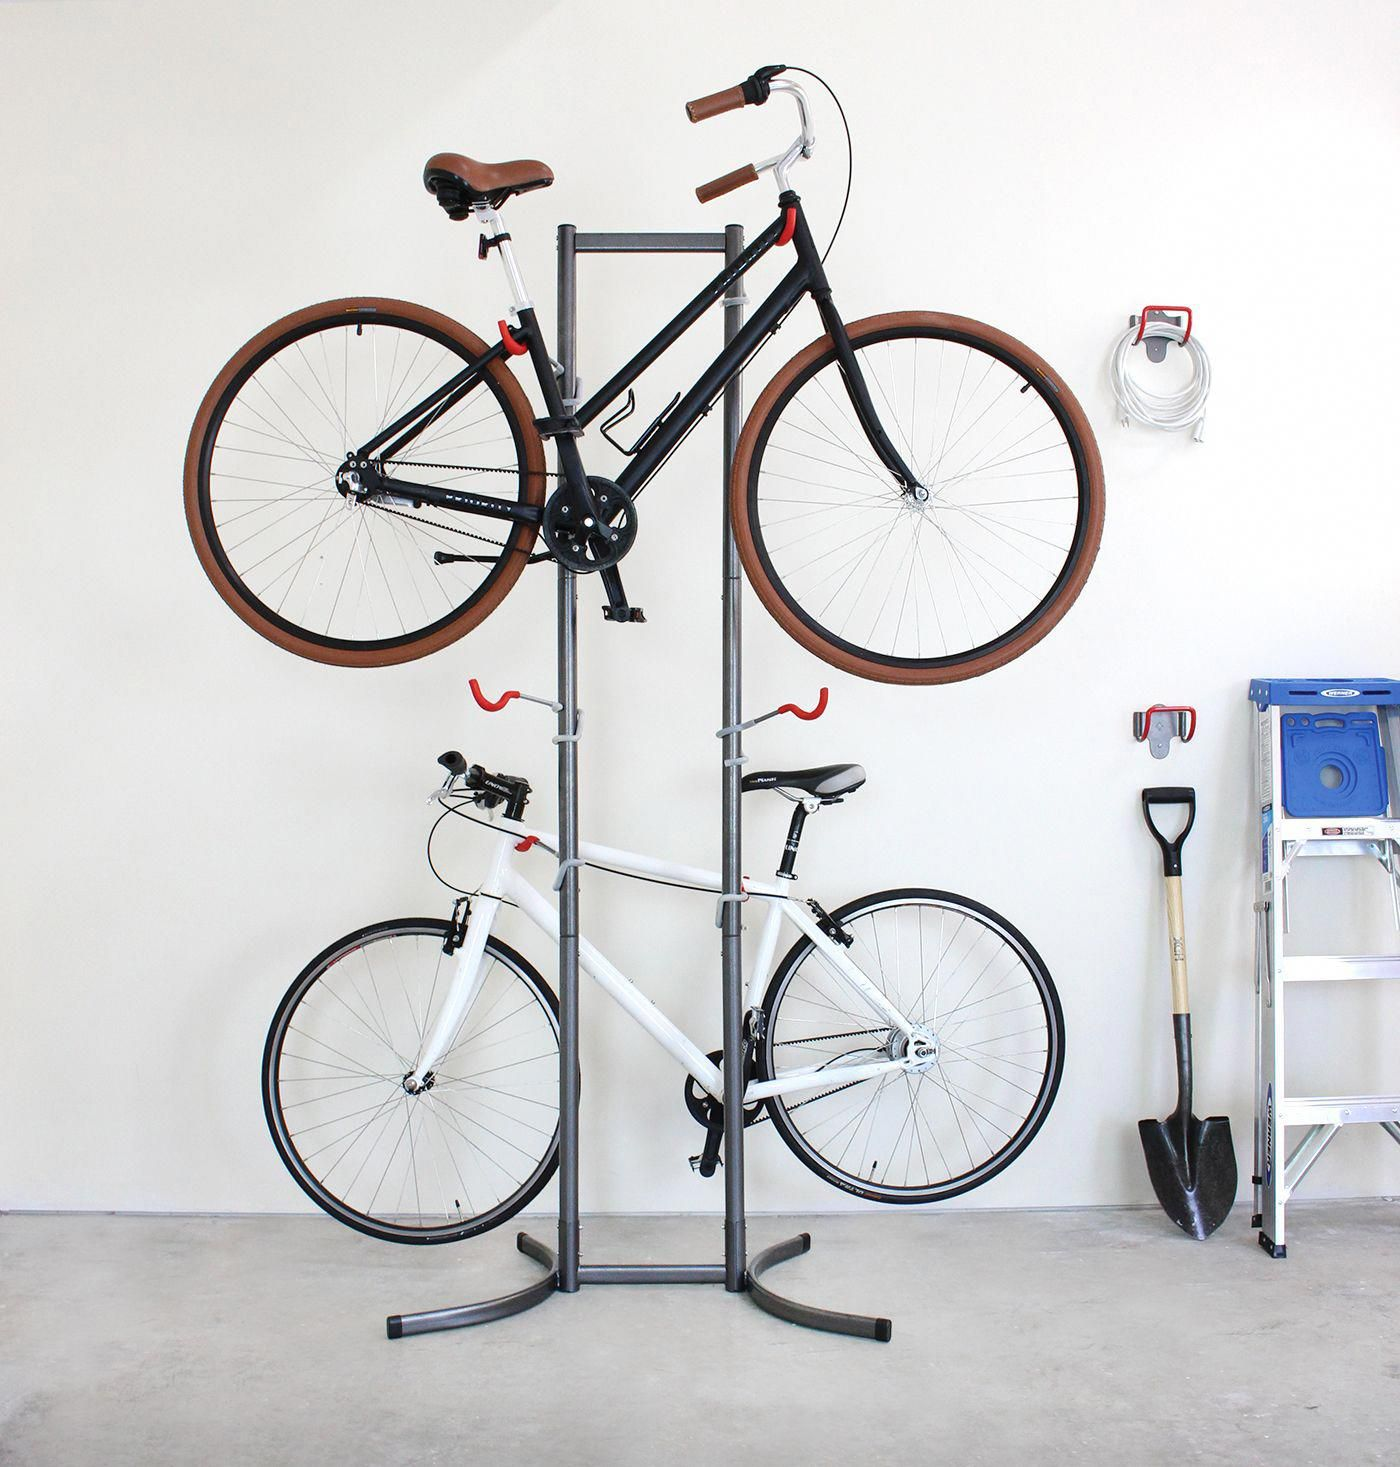 Sports Outdoors In 2020 Indoor Bike Storage Bike Storage